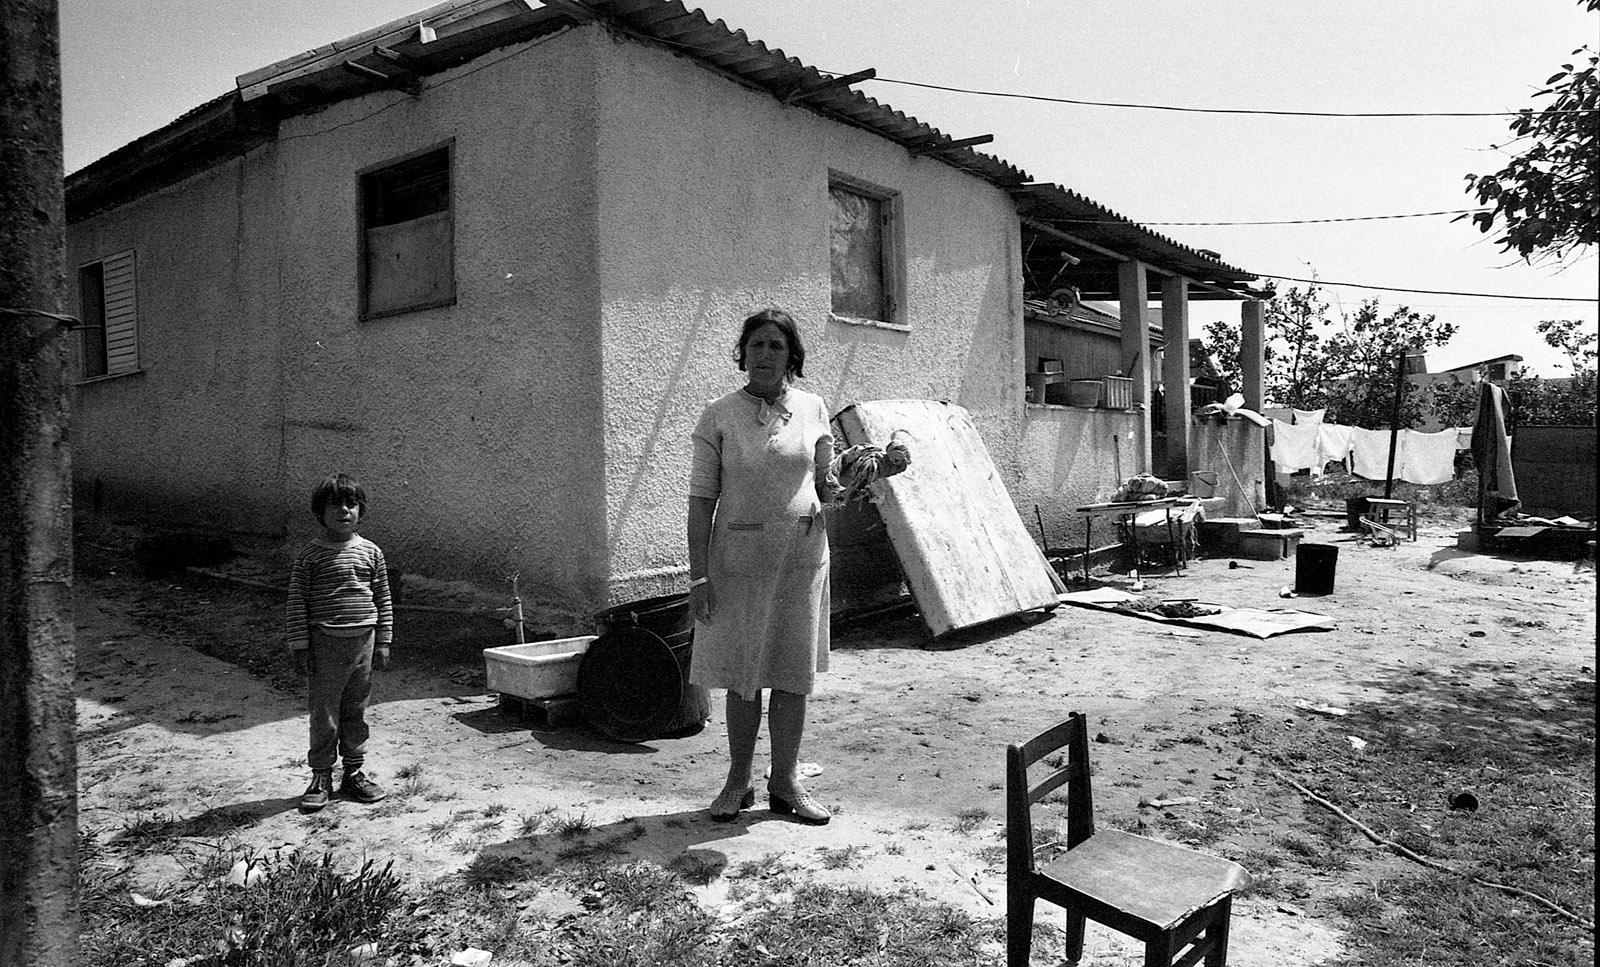 Residents of Ganei Tikvah, near Tel Aviv, Israel, 1982